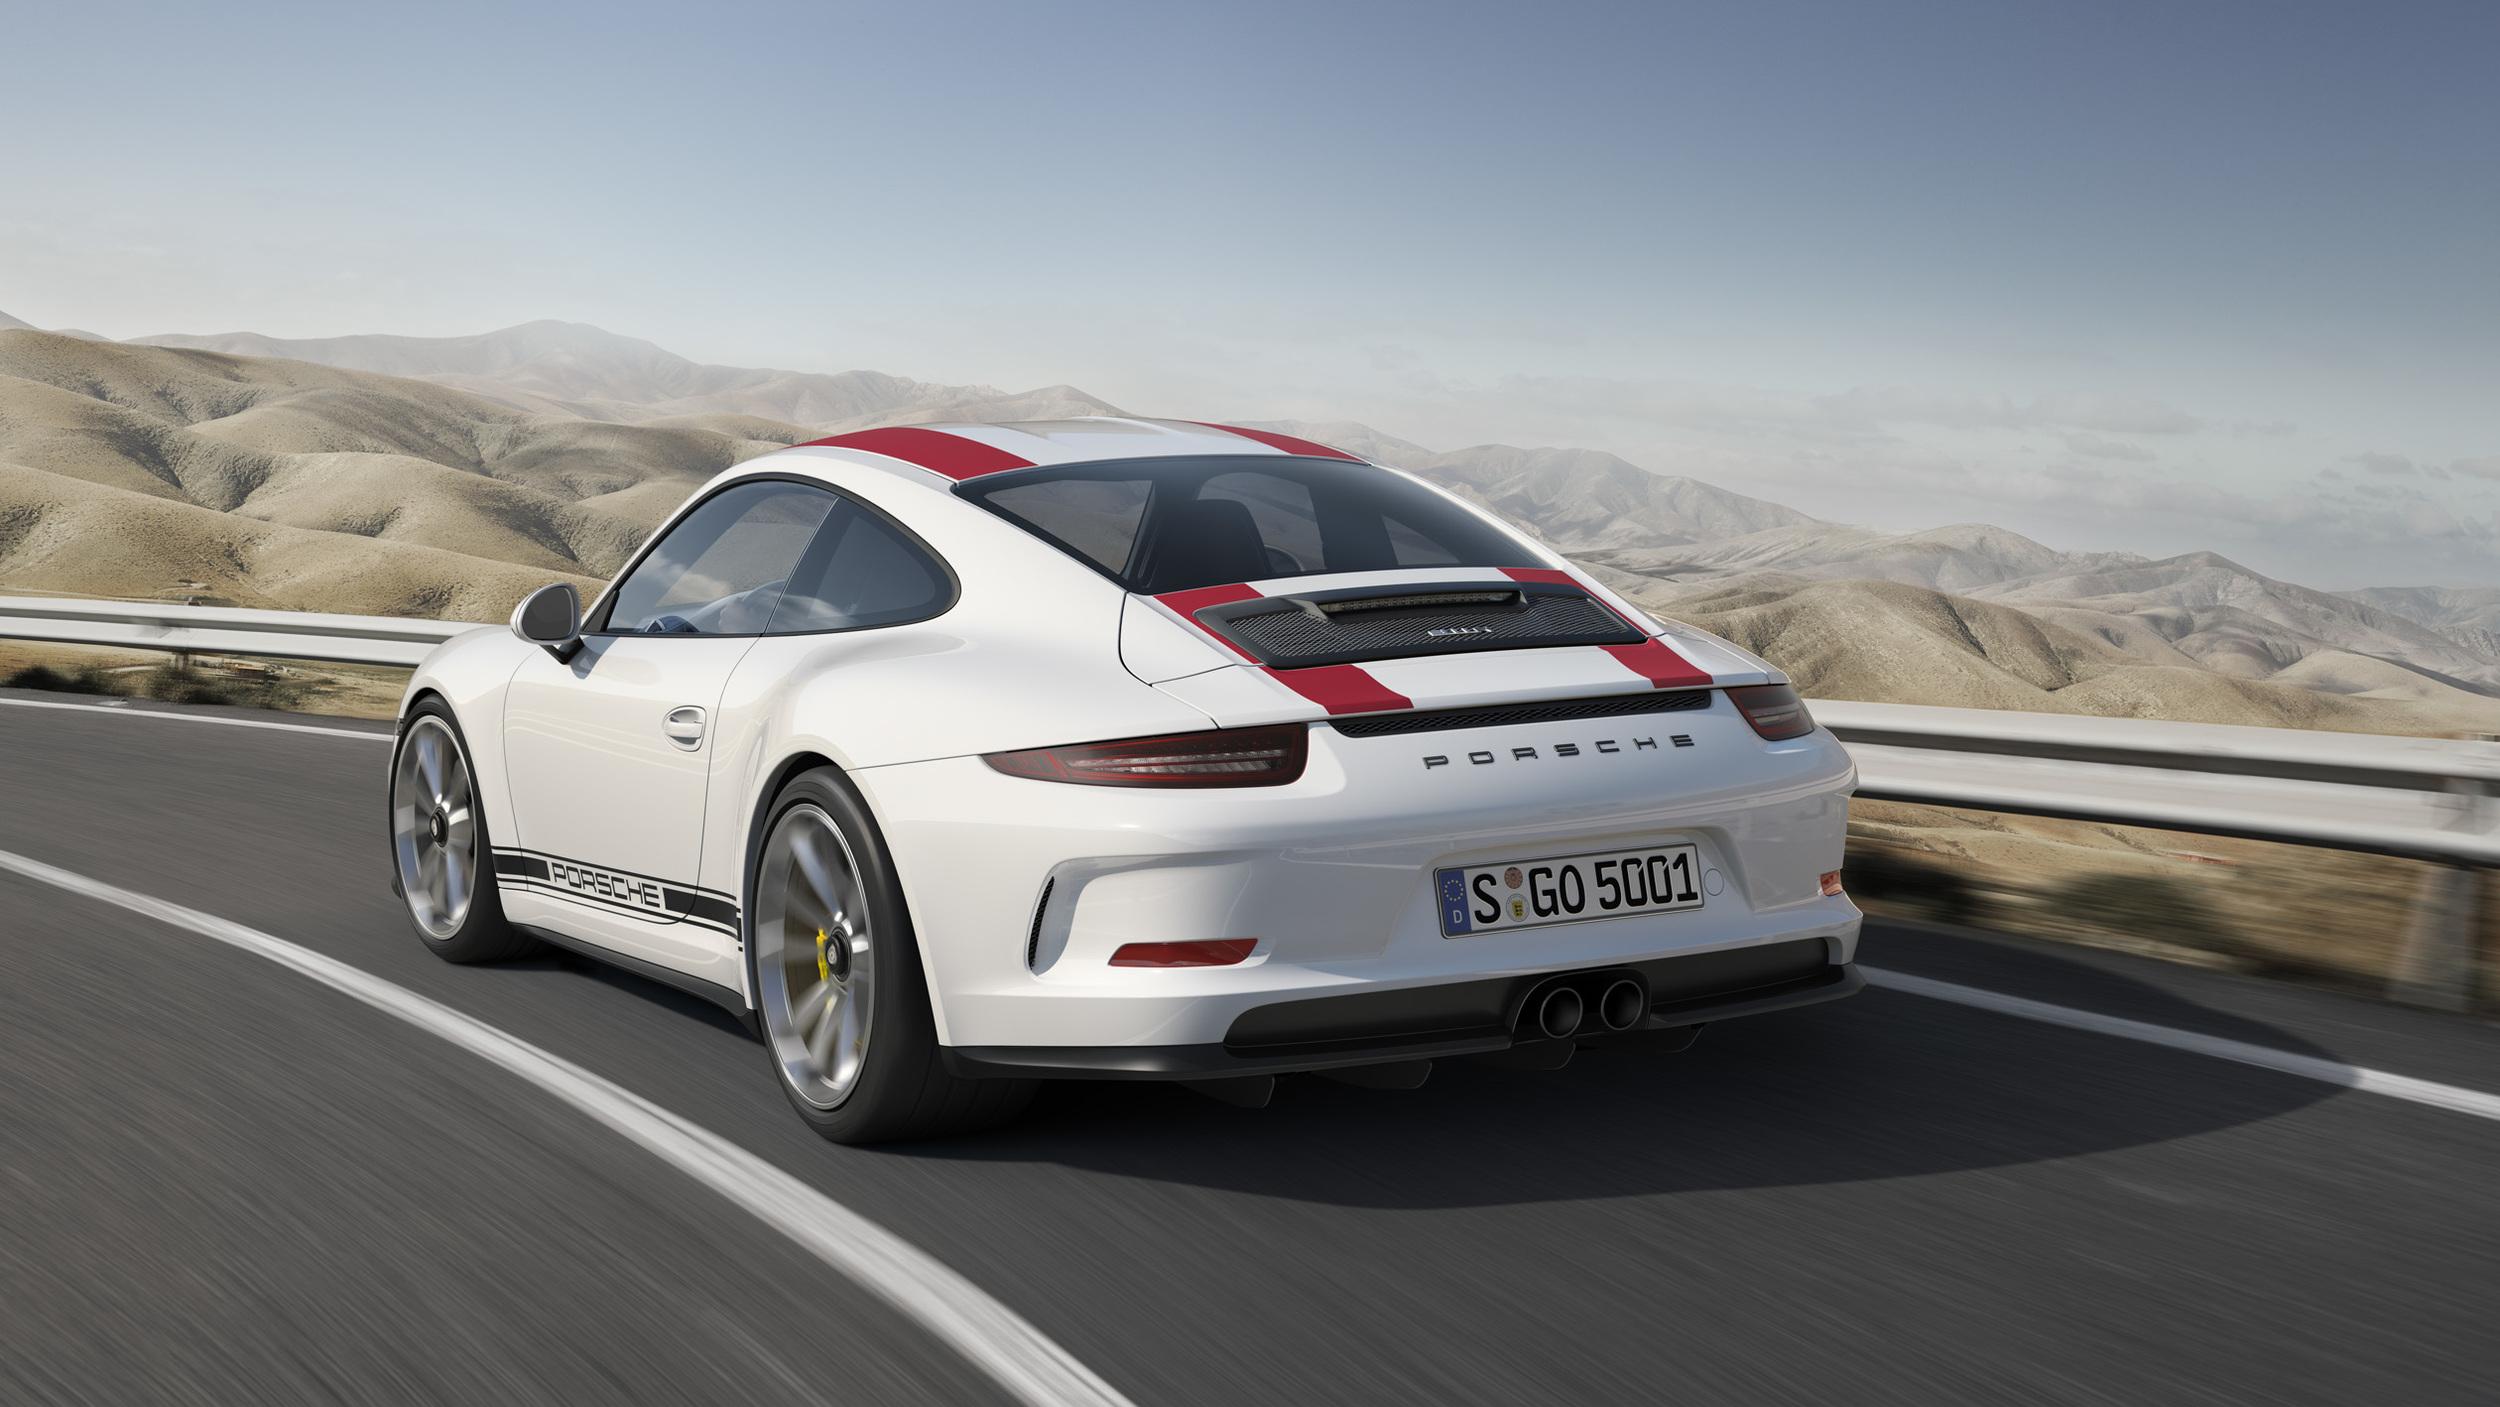 Photo C  ourtesy of   Porsche